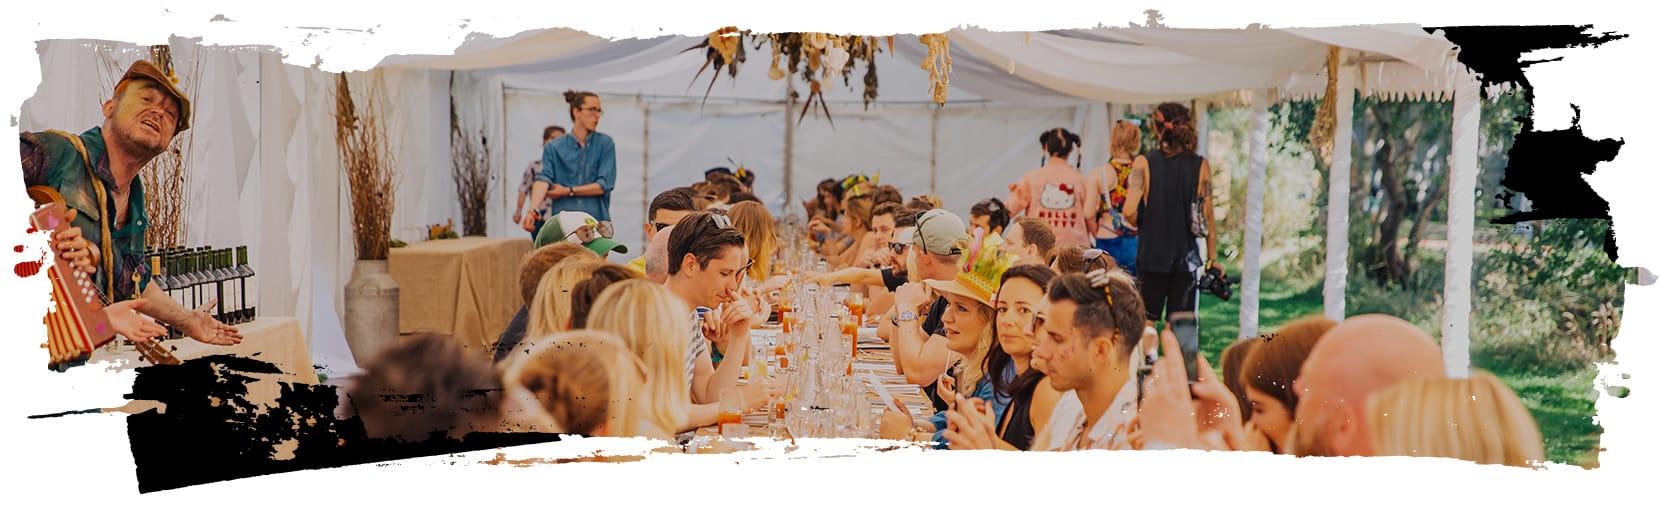 Tribal Banquets